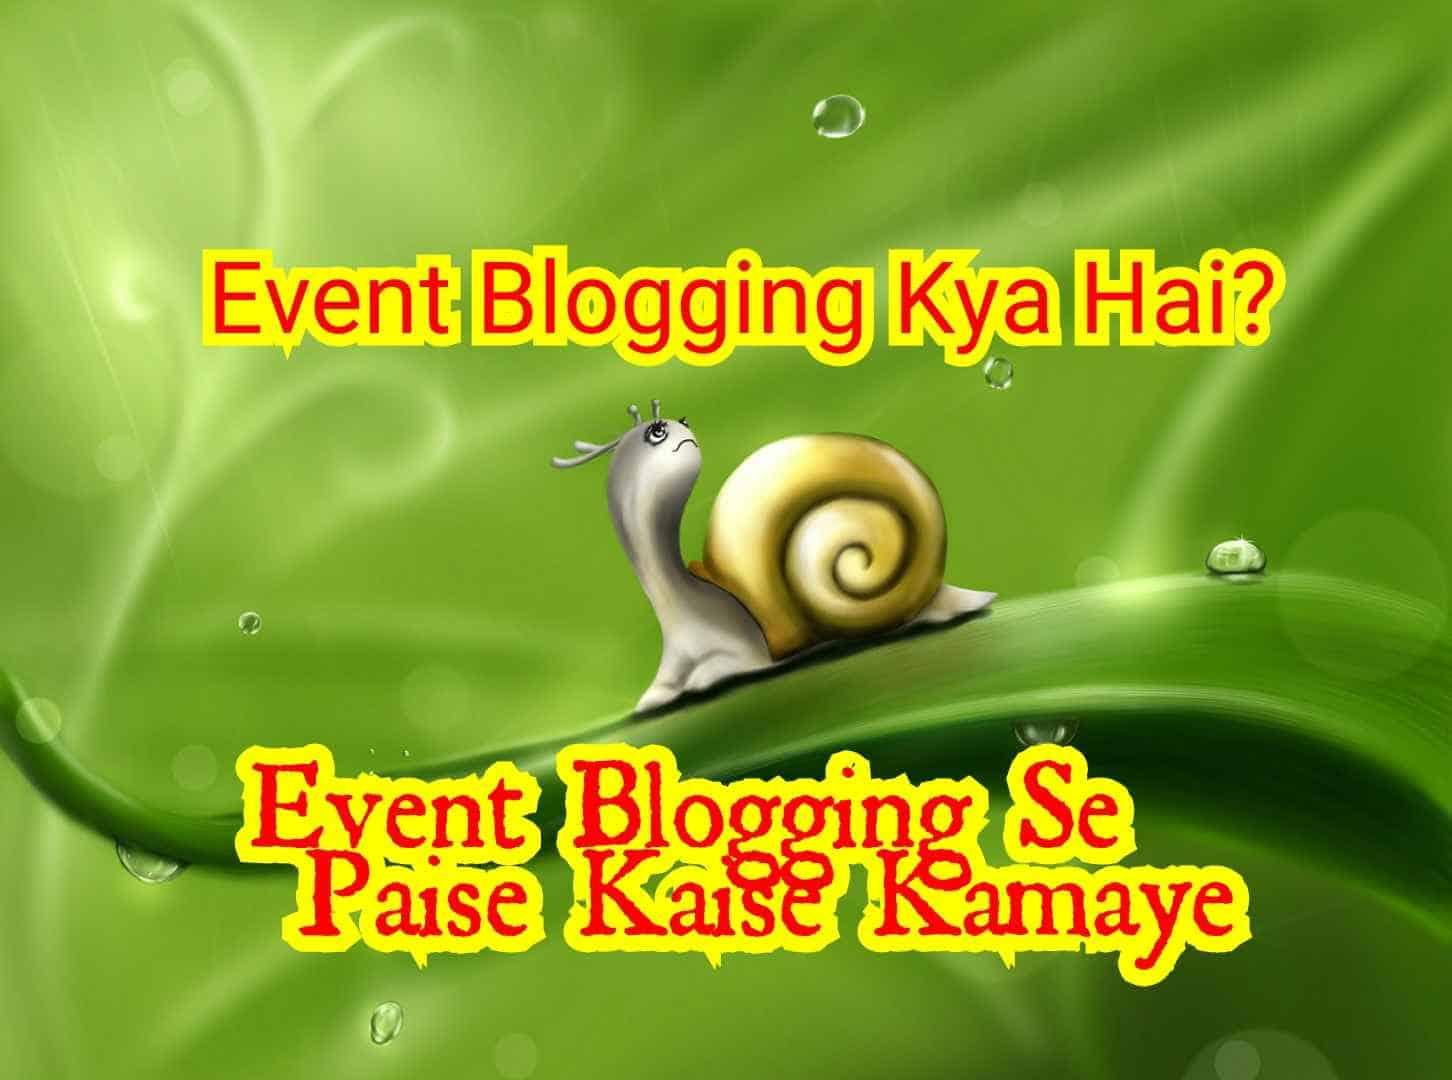 Event Blogging से पैसे कैसे कमाए